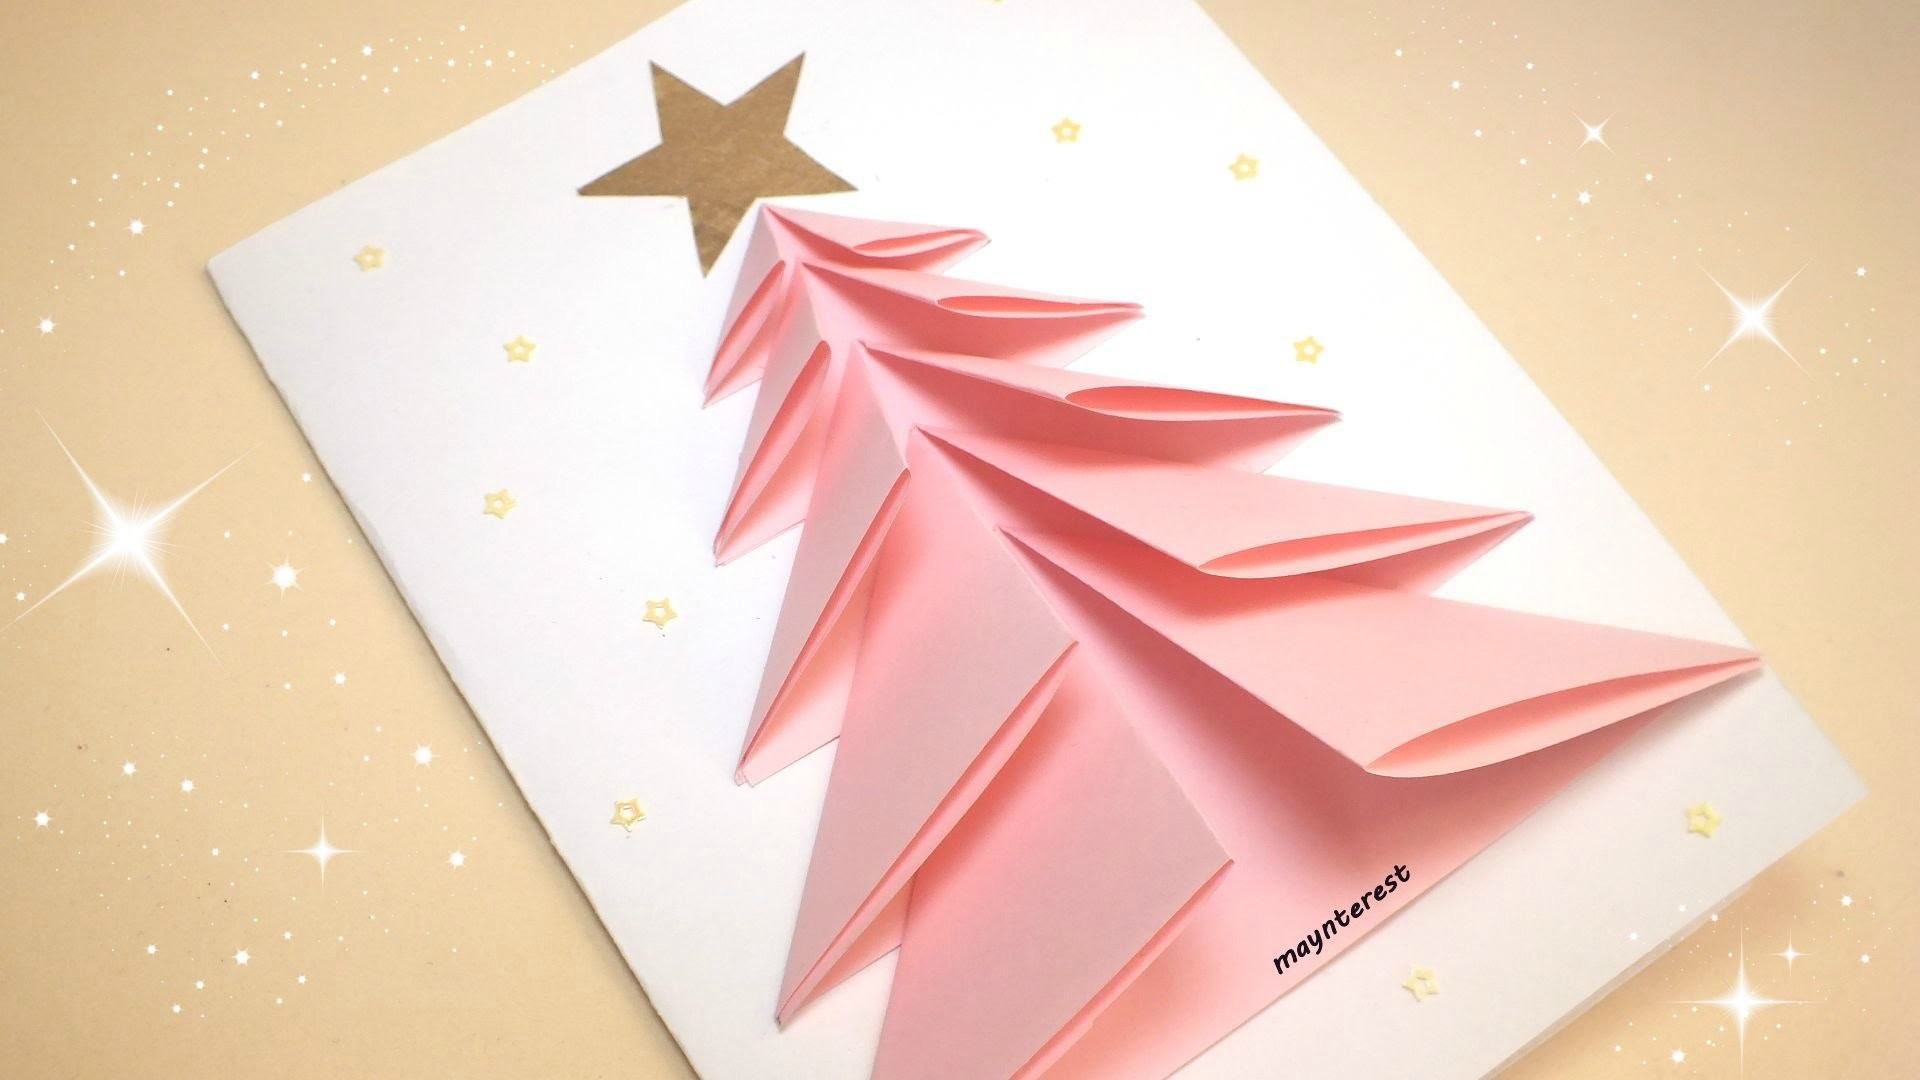 Manualidades navidad tarjeta de felicitaci n navide a - Manualidades postales navidad ...